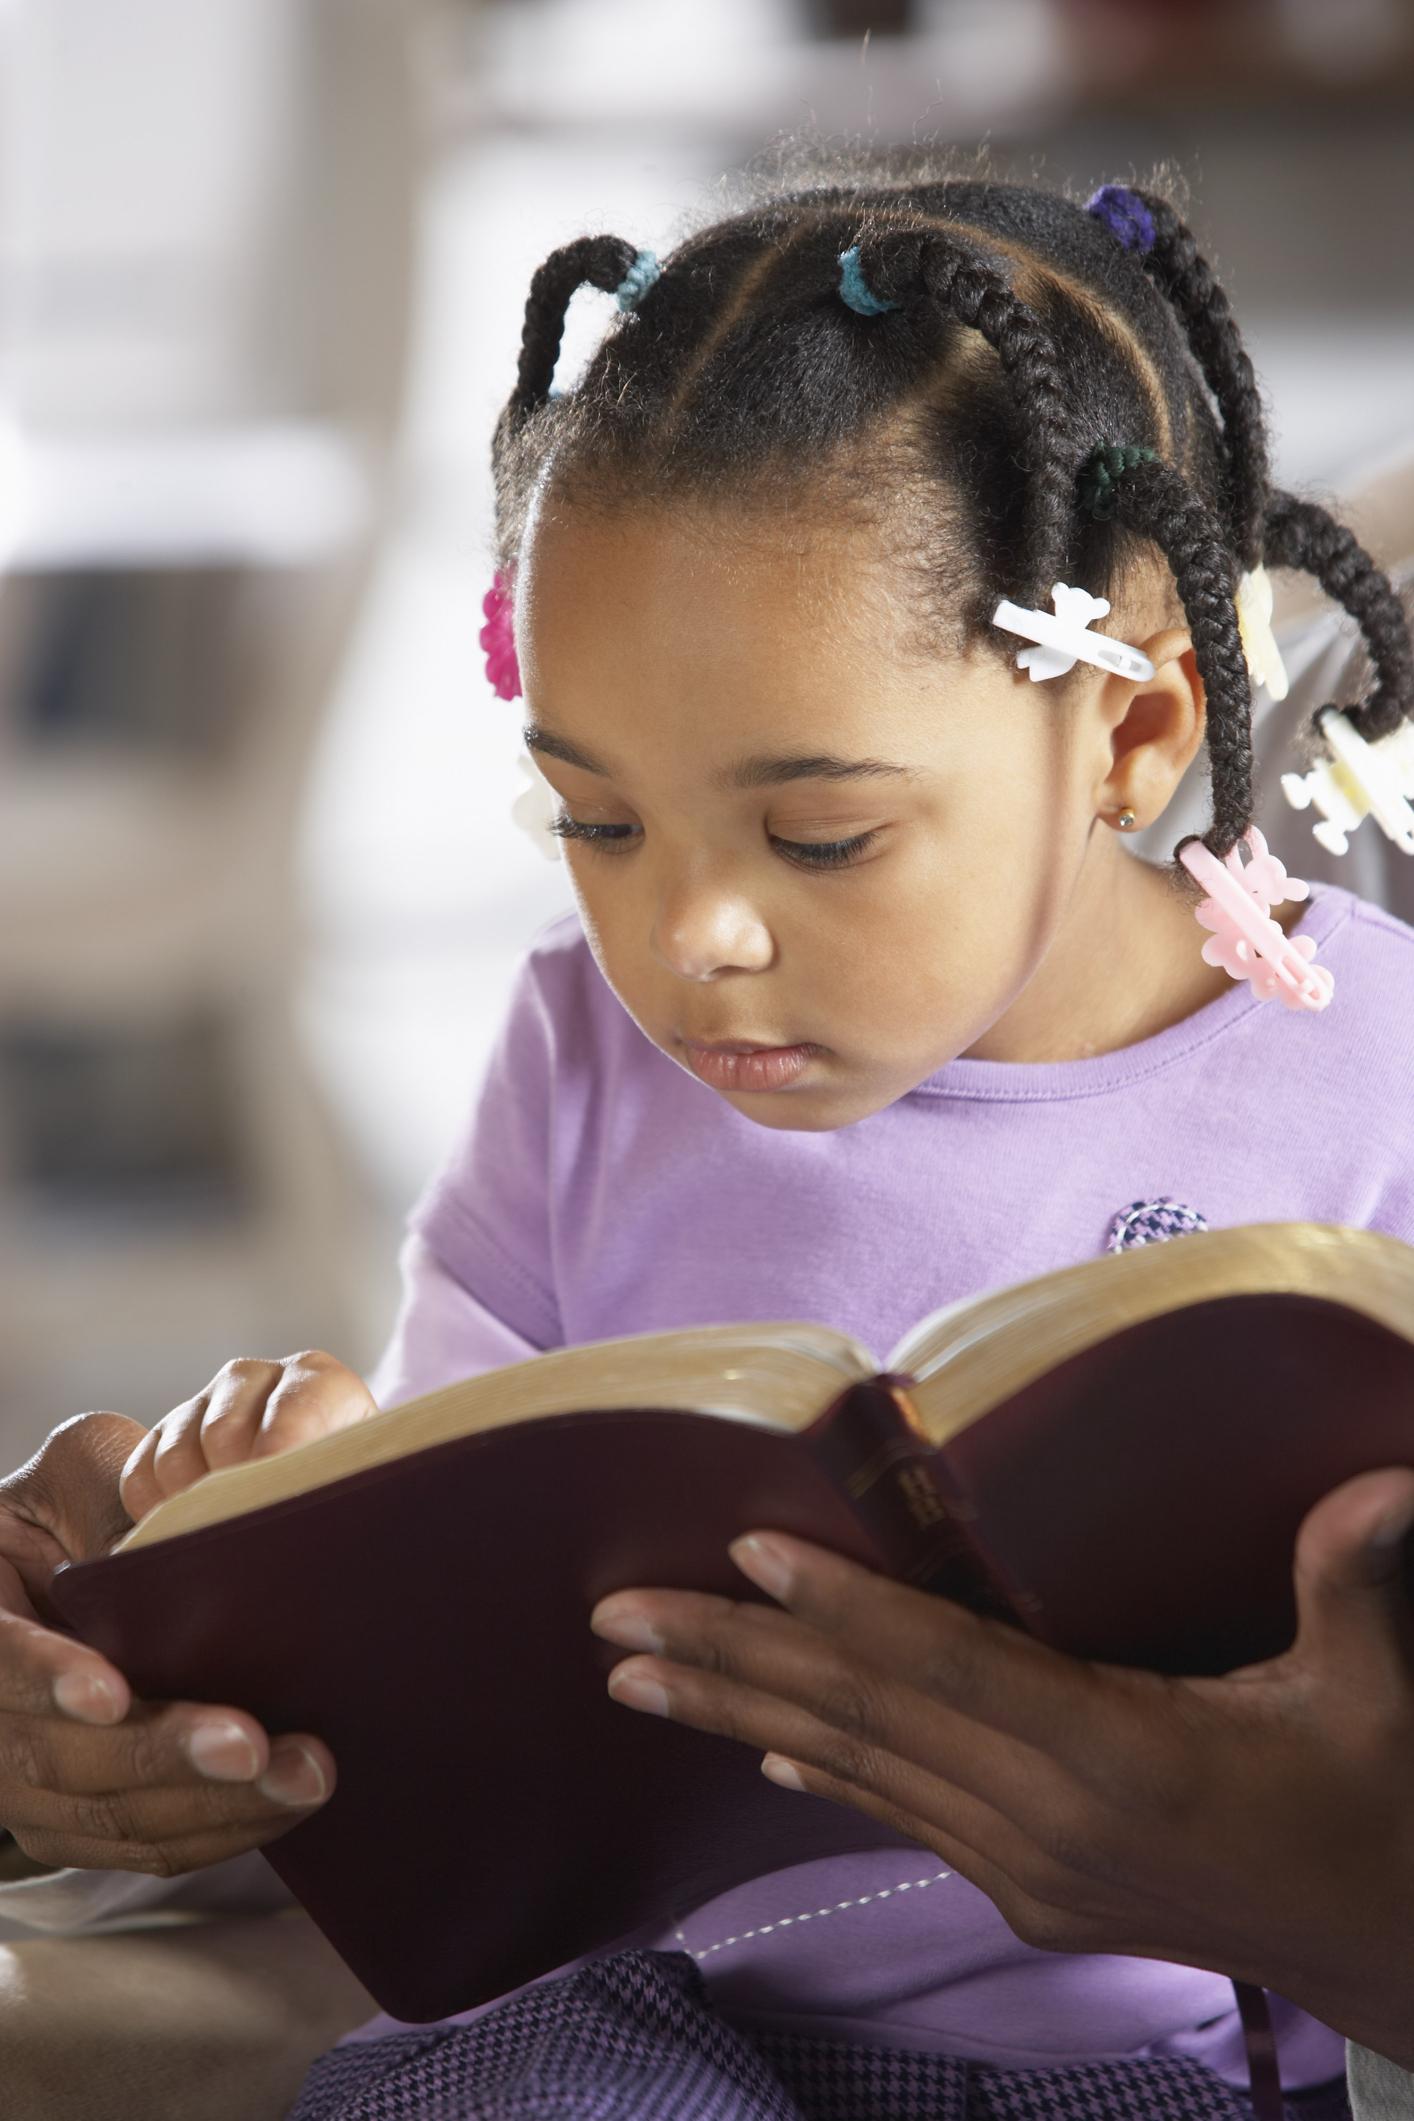 Sunday School Object Lessons for Children